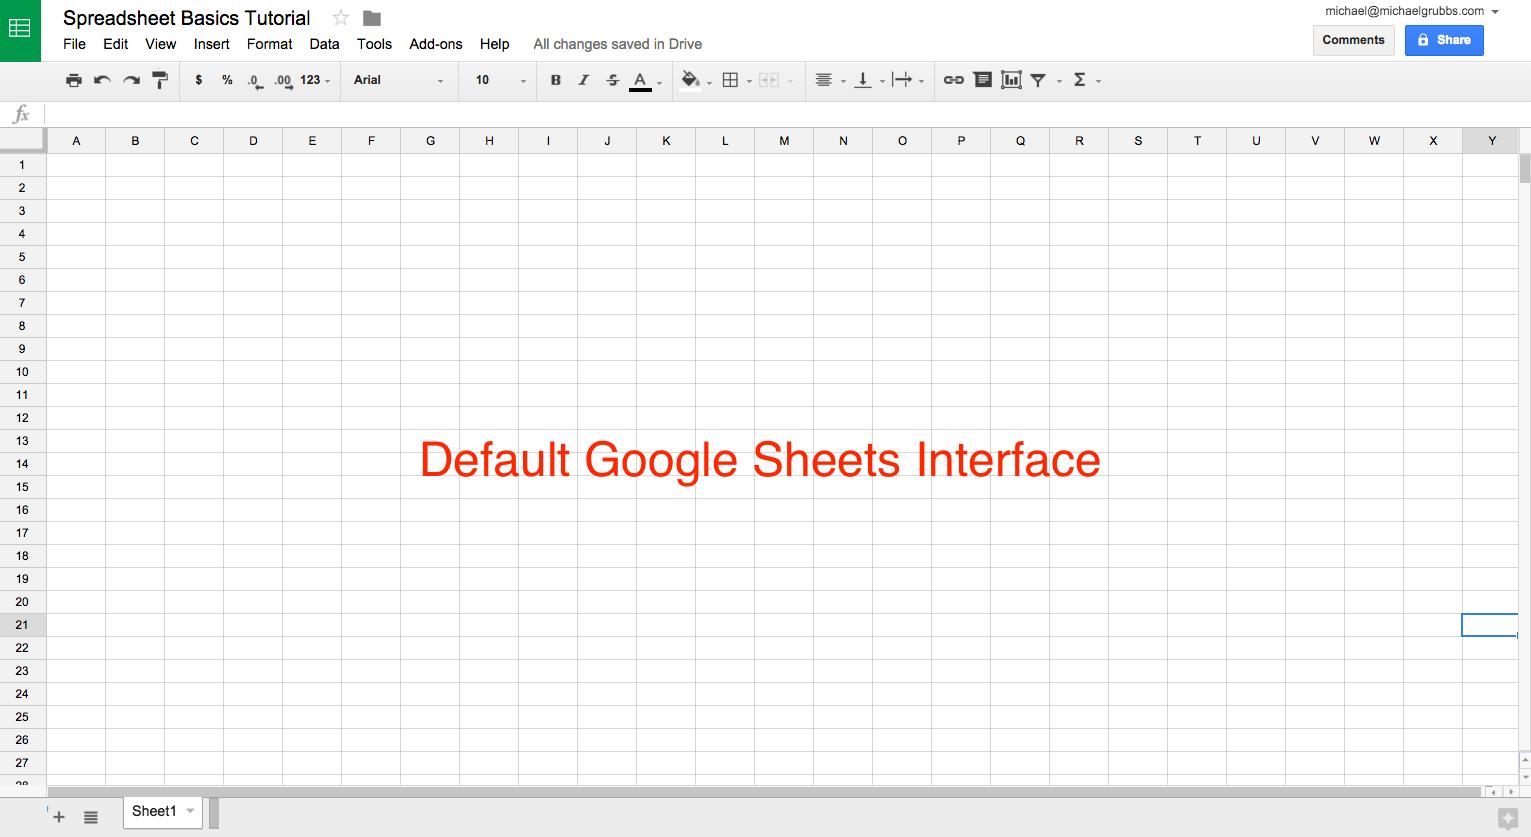 microsoft works spreadsheet tutorial